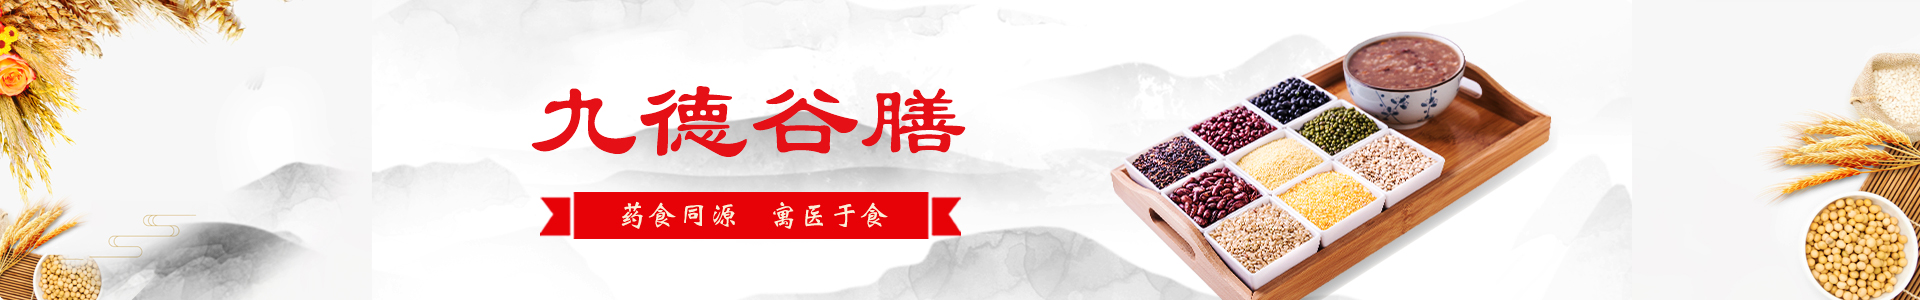 http://www.m.shiguangnan.com/data/upload/201911/20191121141401_607.jpg